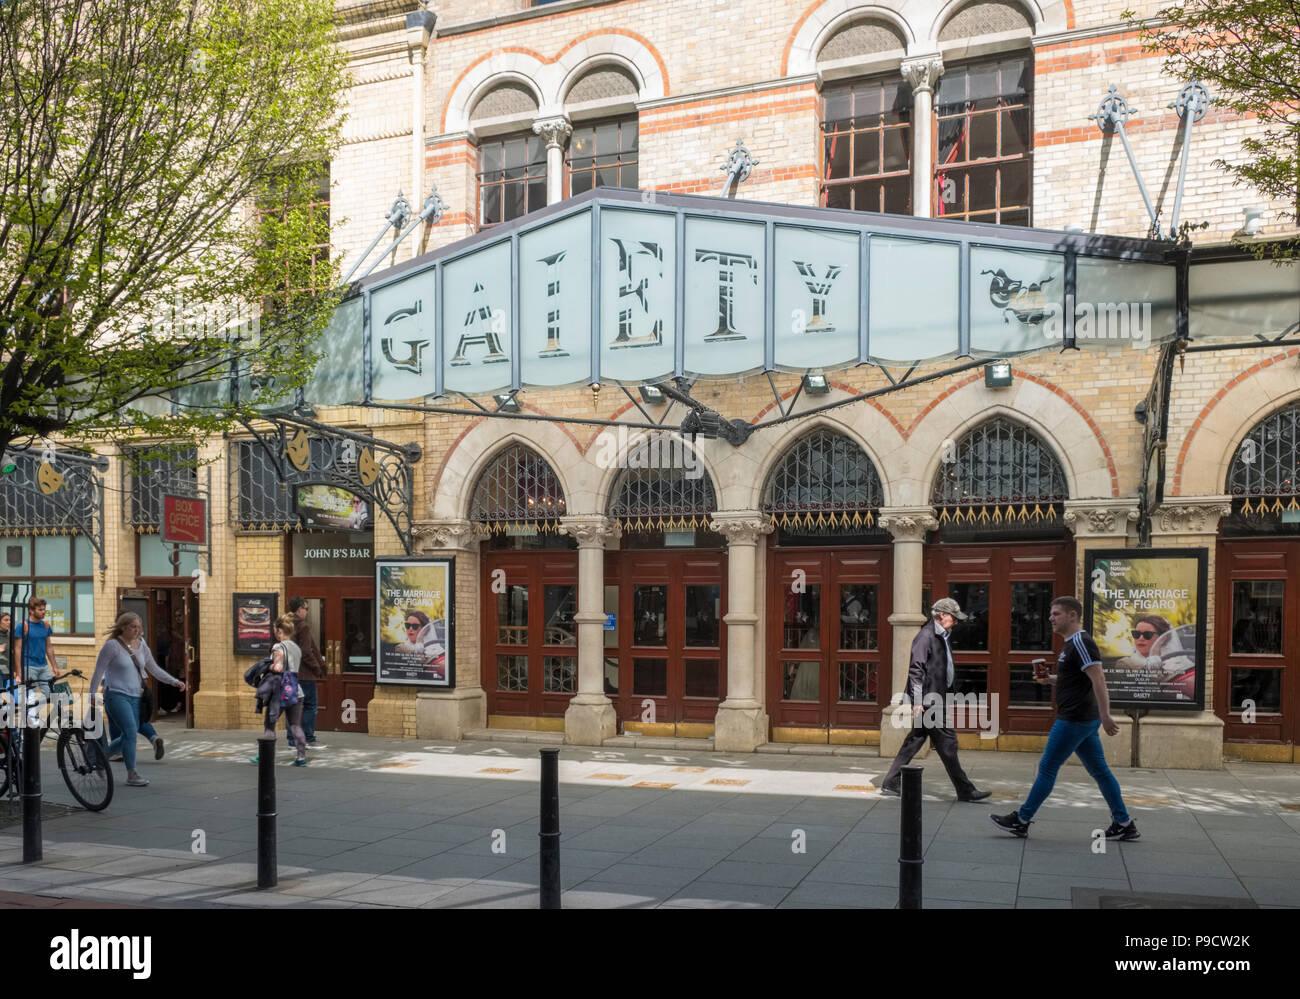 The Gaiety Theatre, Dublin, Ireland, Europe - Stock Image